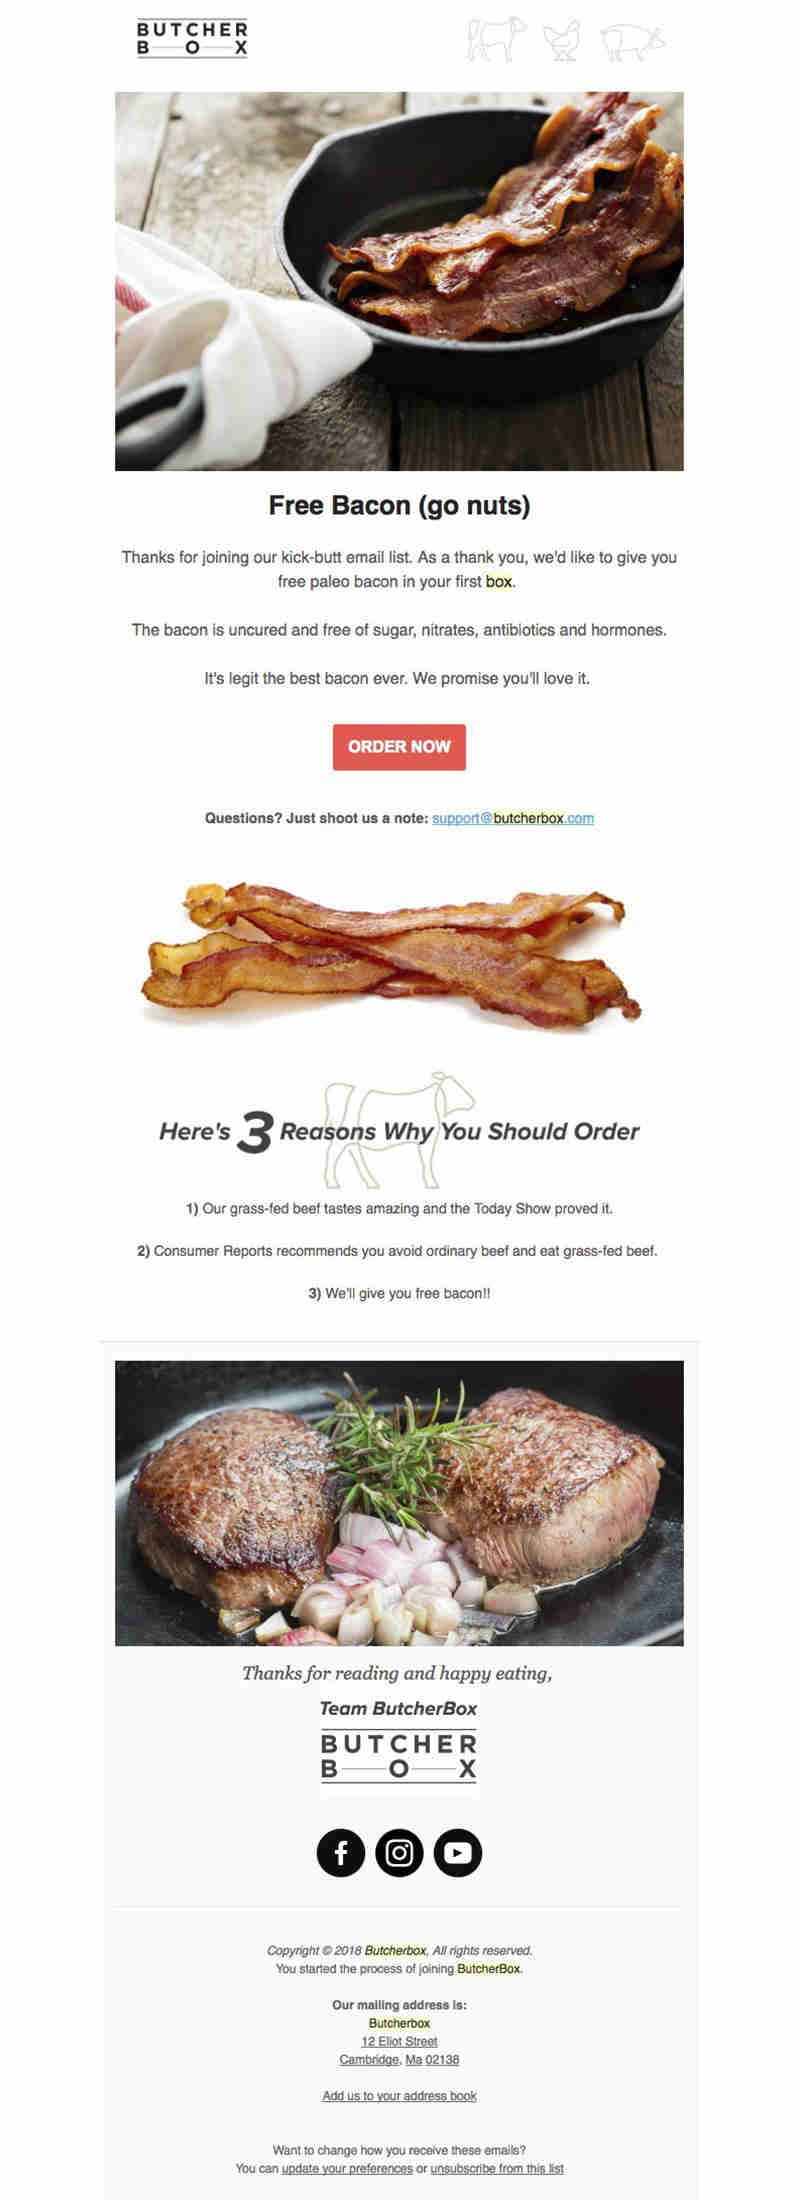 butcher_box email marketing